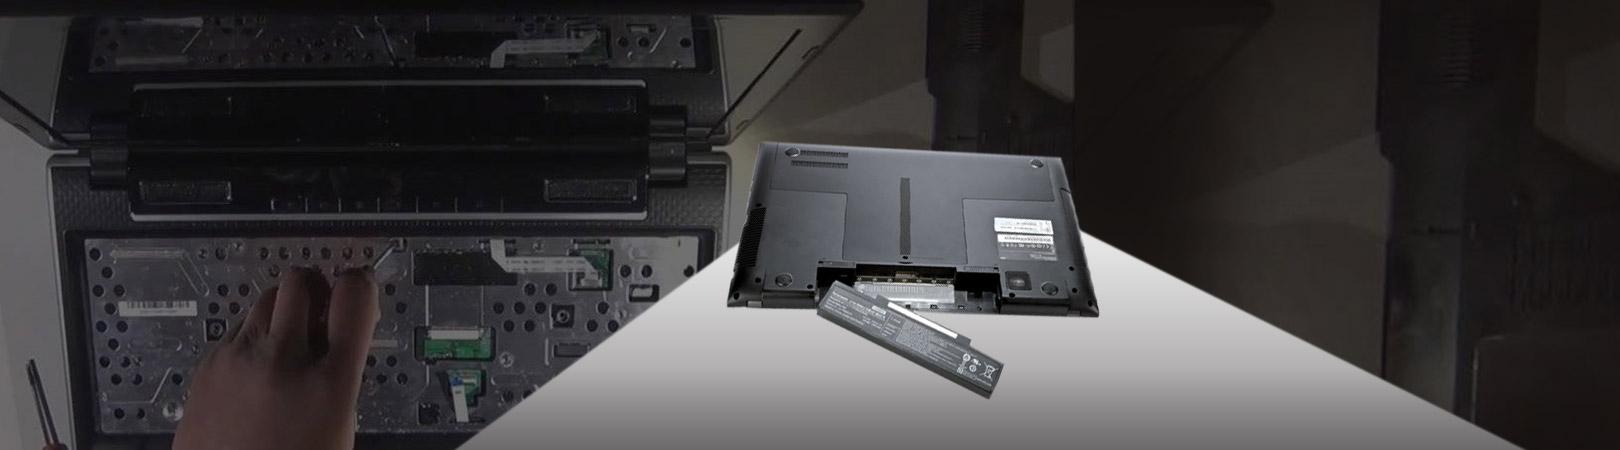 Acer Laptop Battery Replacement Dubai